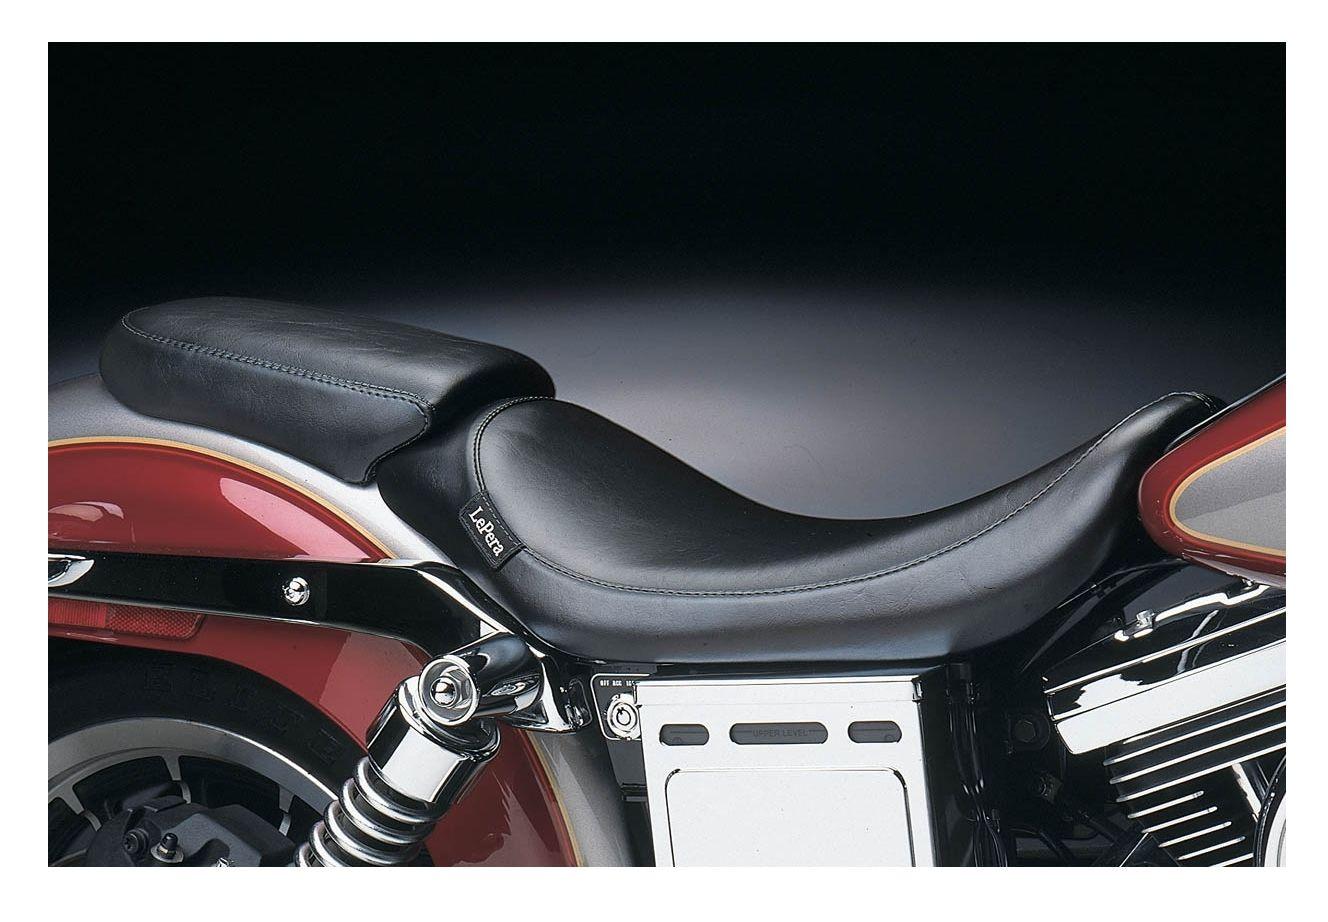 Le Pera Silhouette Solo Seat For Harley Dyna 1996 2003 10 2502 07 Flhtcu Wiring Diagrams Color Off Revzilla